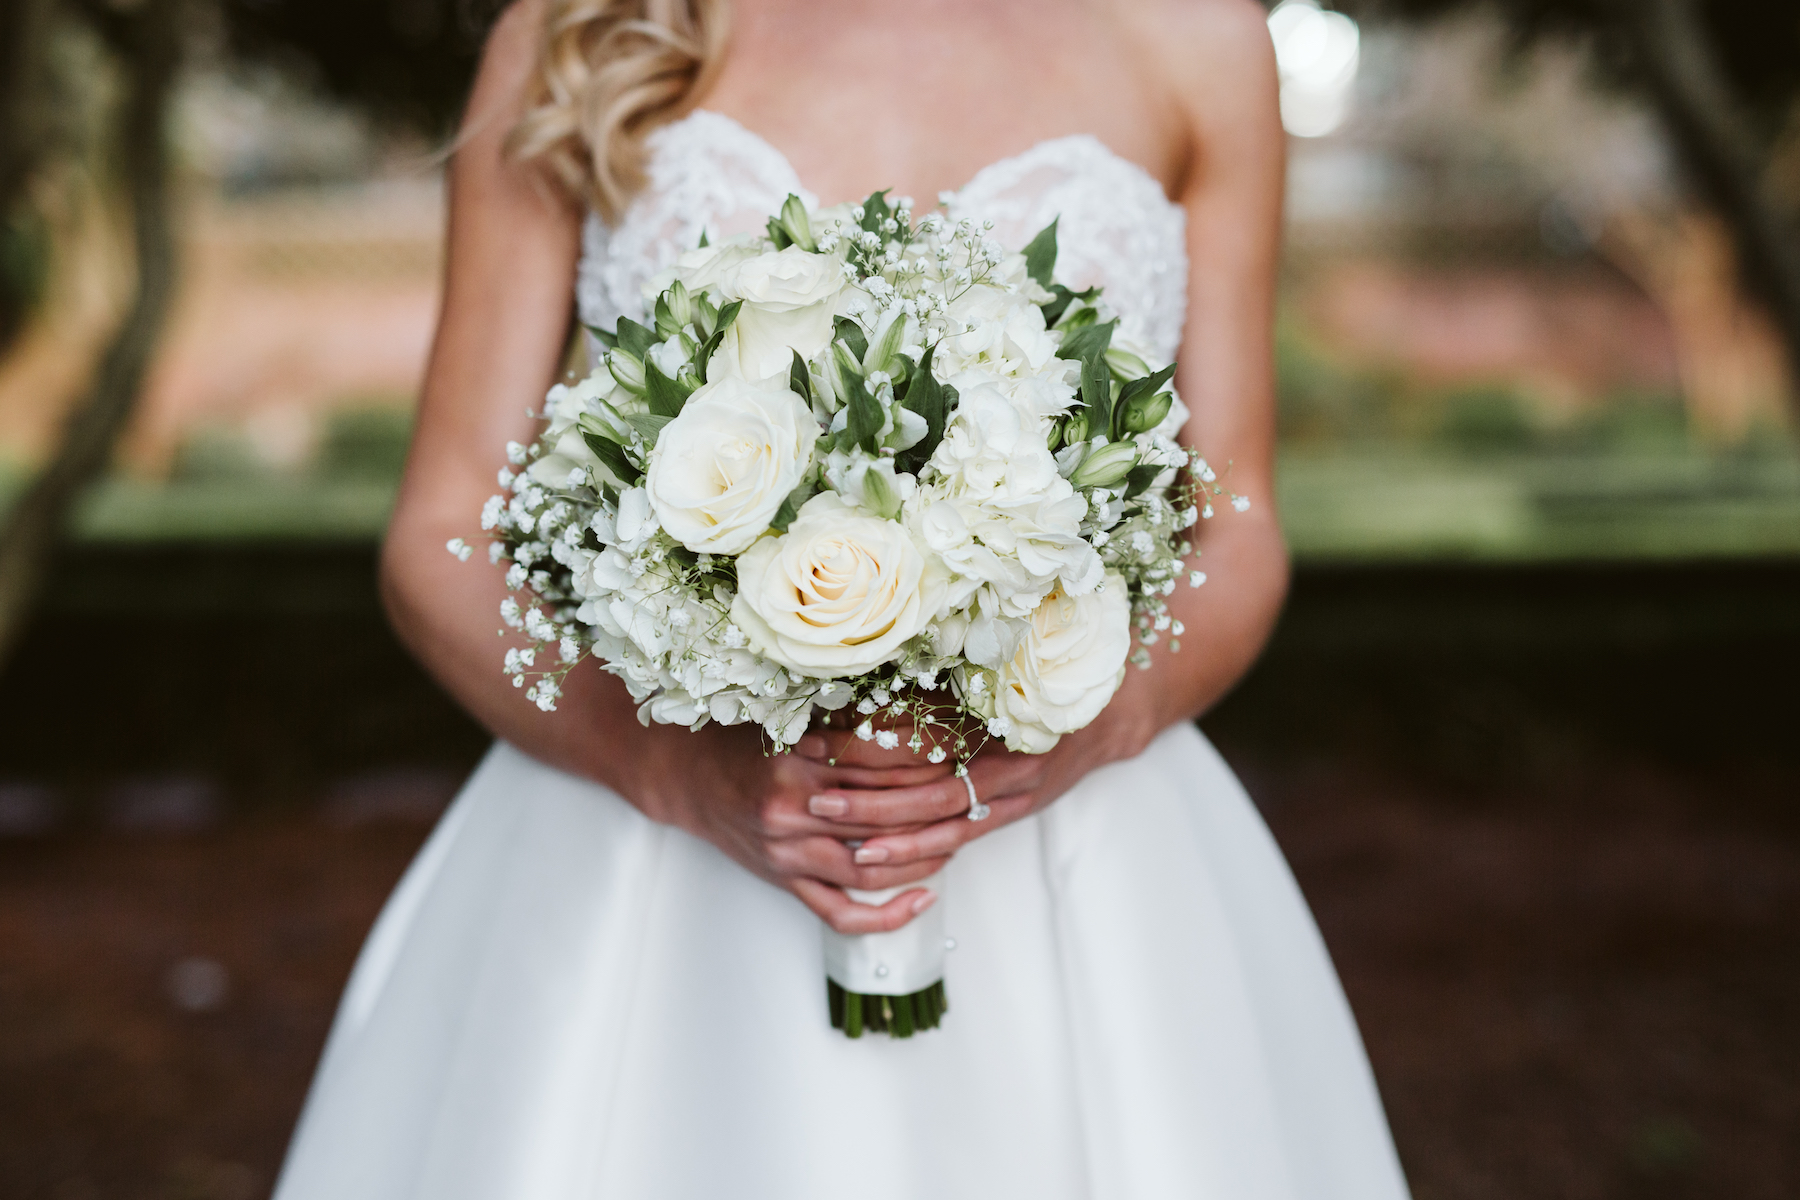 furman-university-bridals-paige-216.JPG